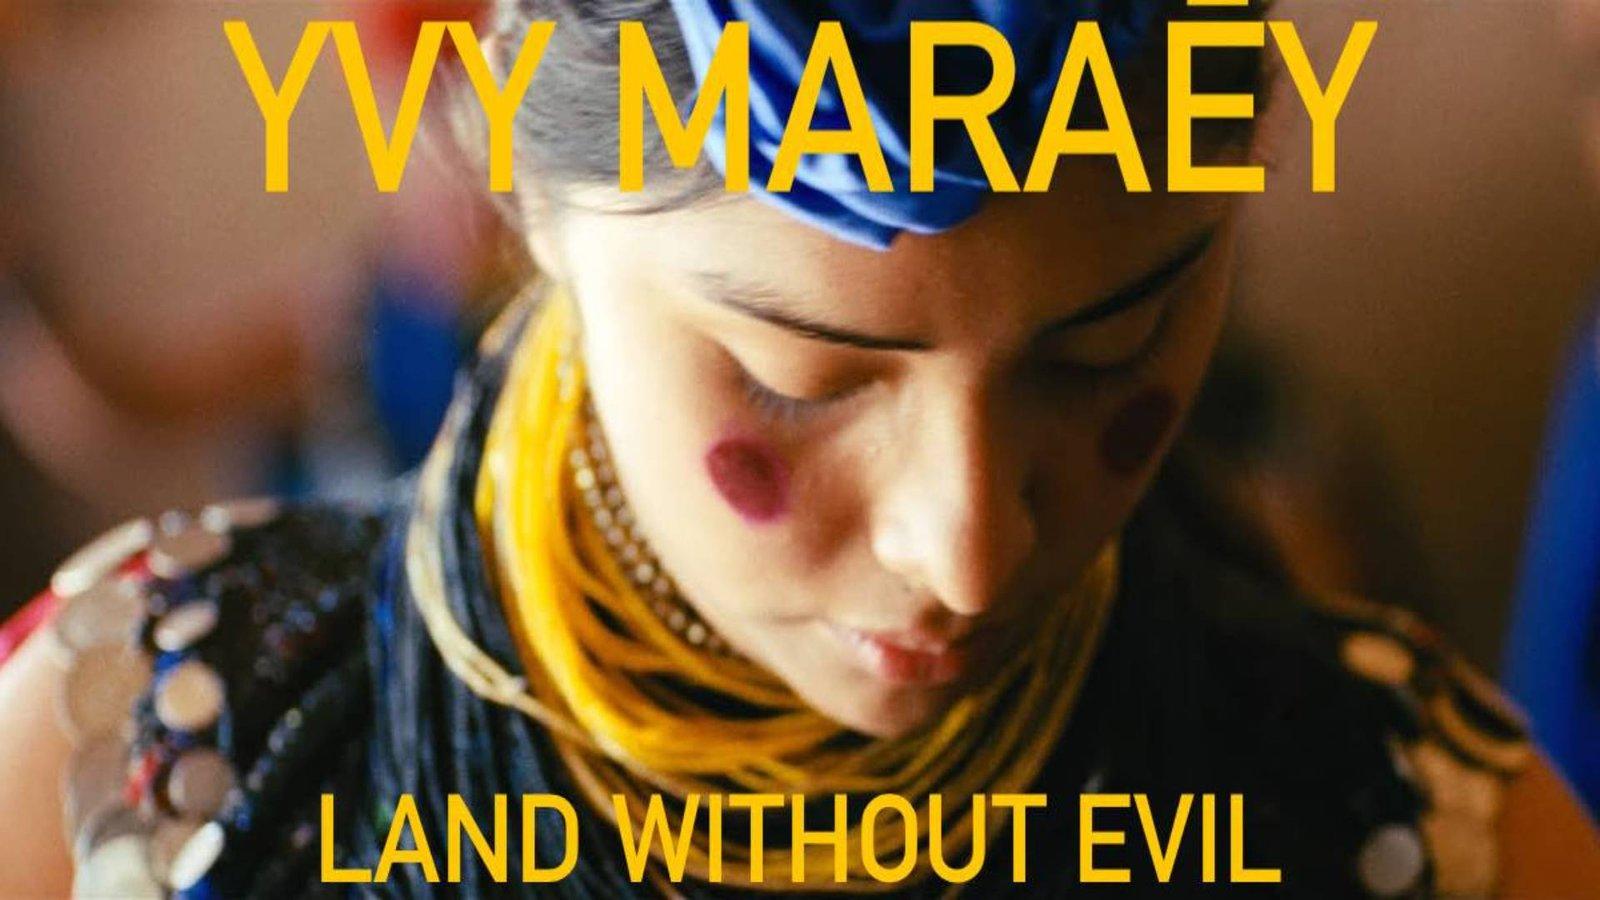 Yvy Maraey, Land Without Evil - Yvy Maraey, Tierra Sin Mal